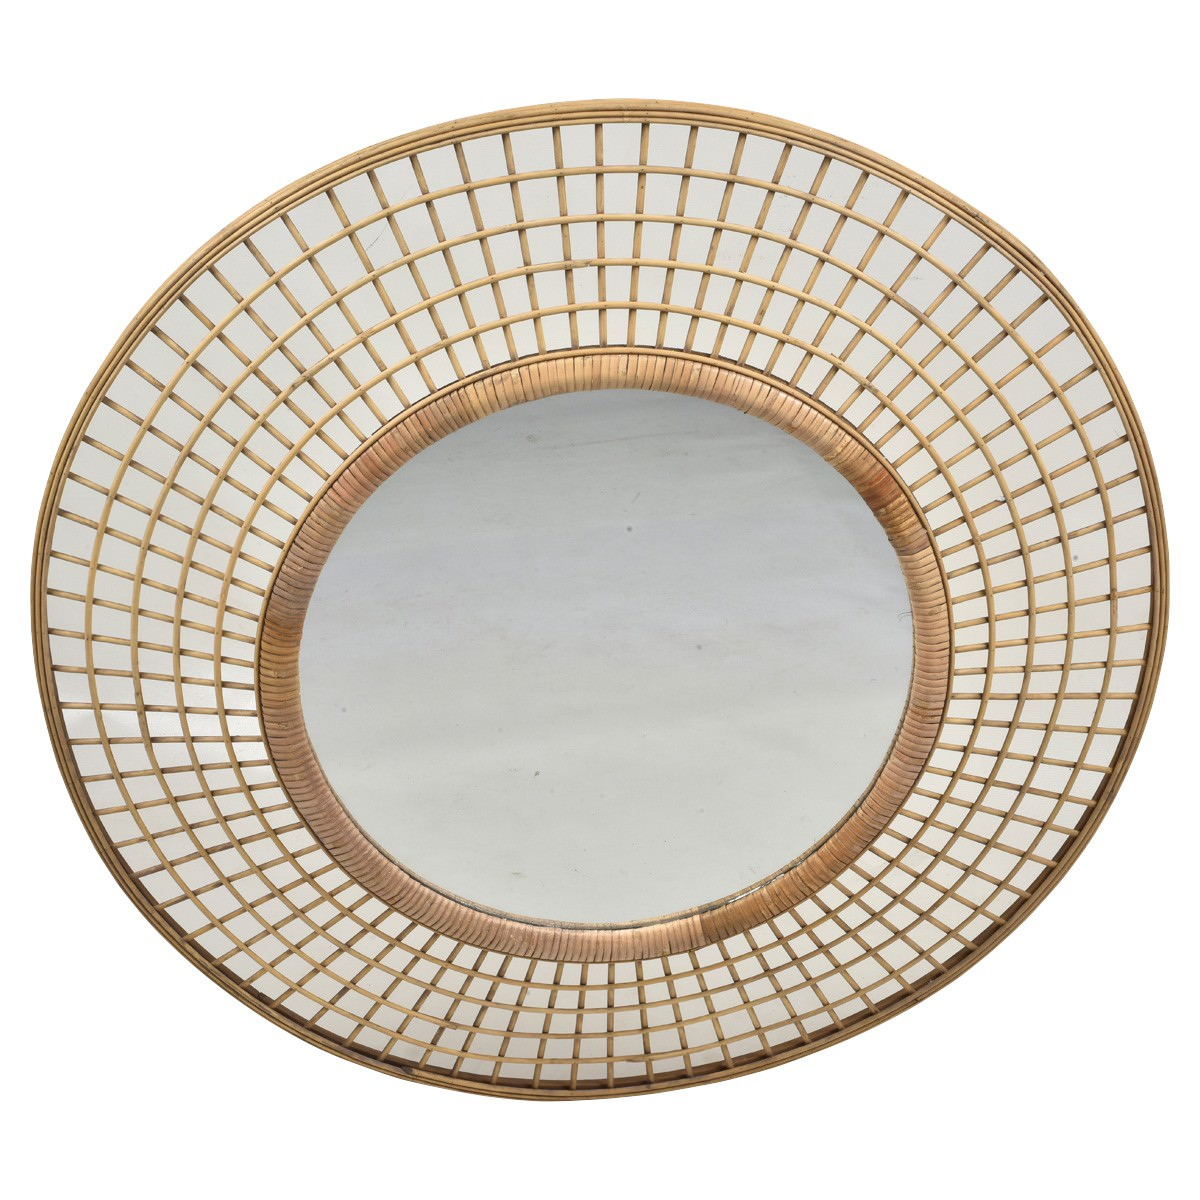 Royena Bamboo Rattan Framed Round Wall Mirror, 90cm